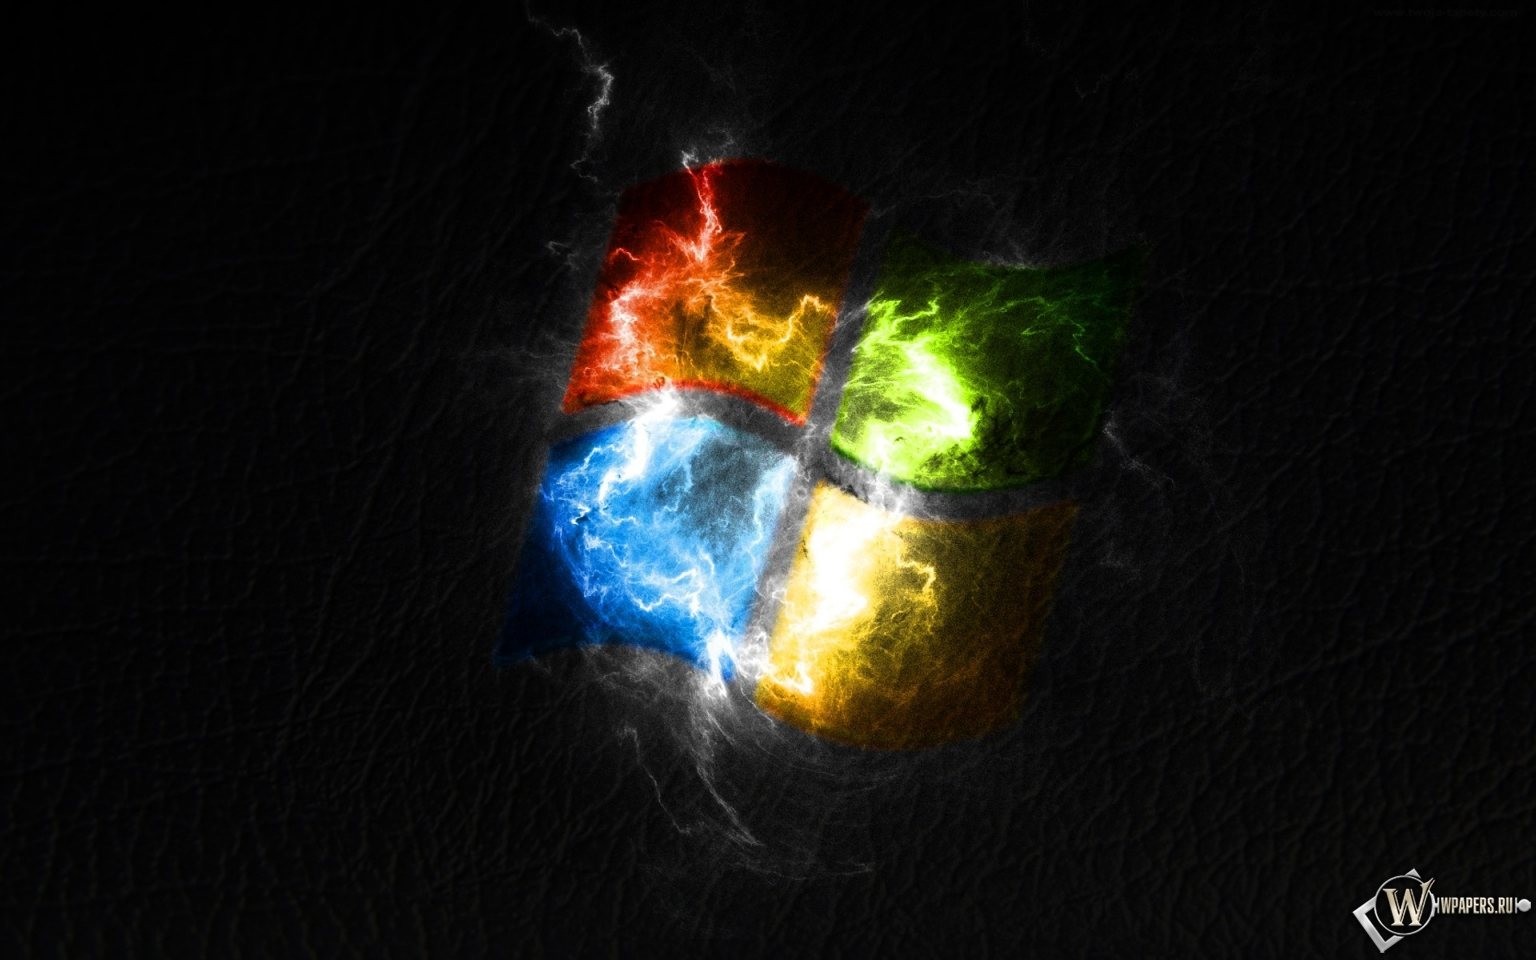 Скачать обои Windows xp creative (Дымок, Windows XP ...: wpapers.ru/wallpapers/comp/Windows/7057/1536-960_Windows-xp...